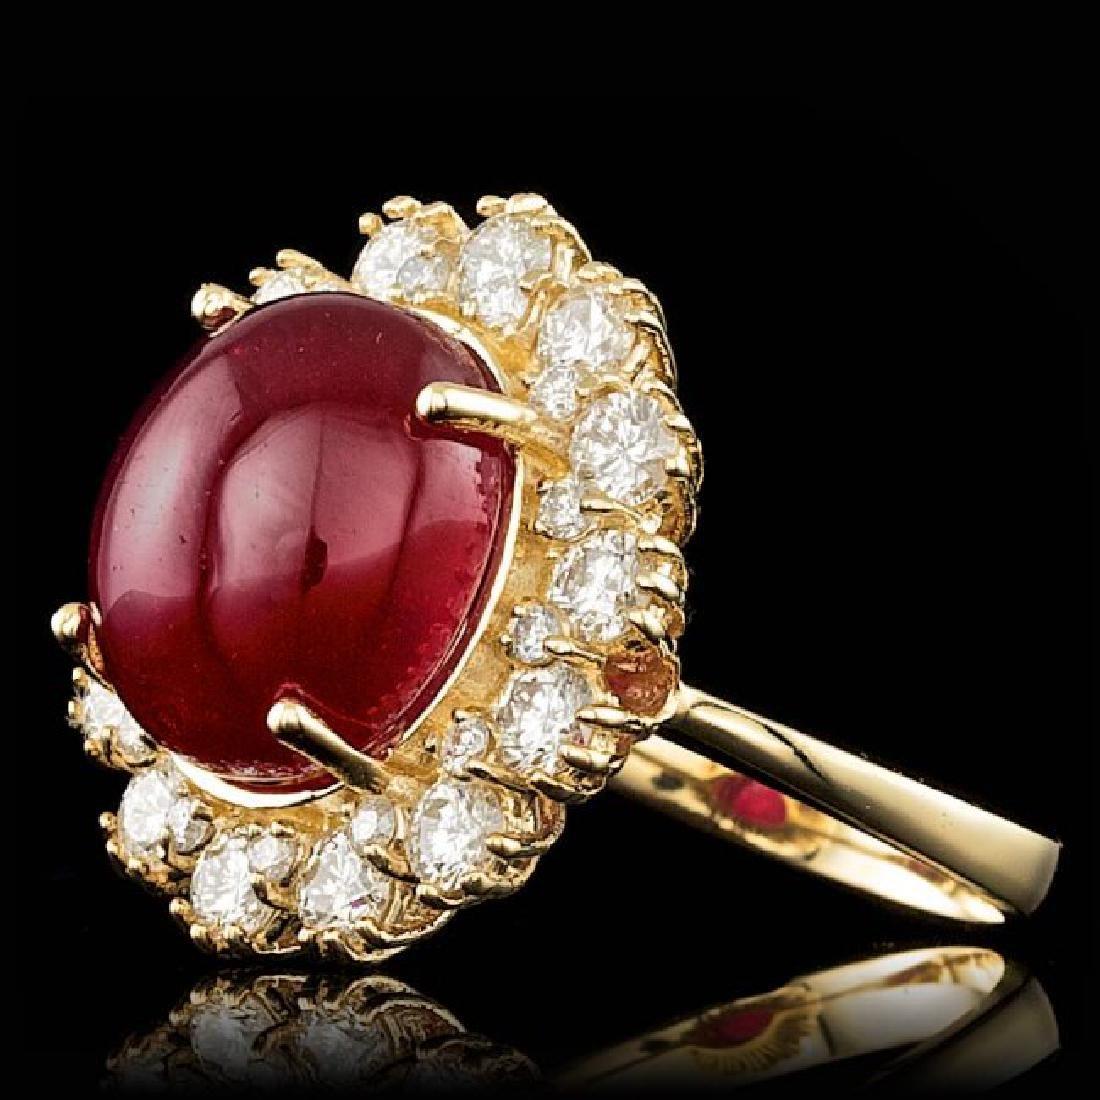 14k Yellow Gold 9.50ct Ruby 1.40ct Diamond Ring - 2